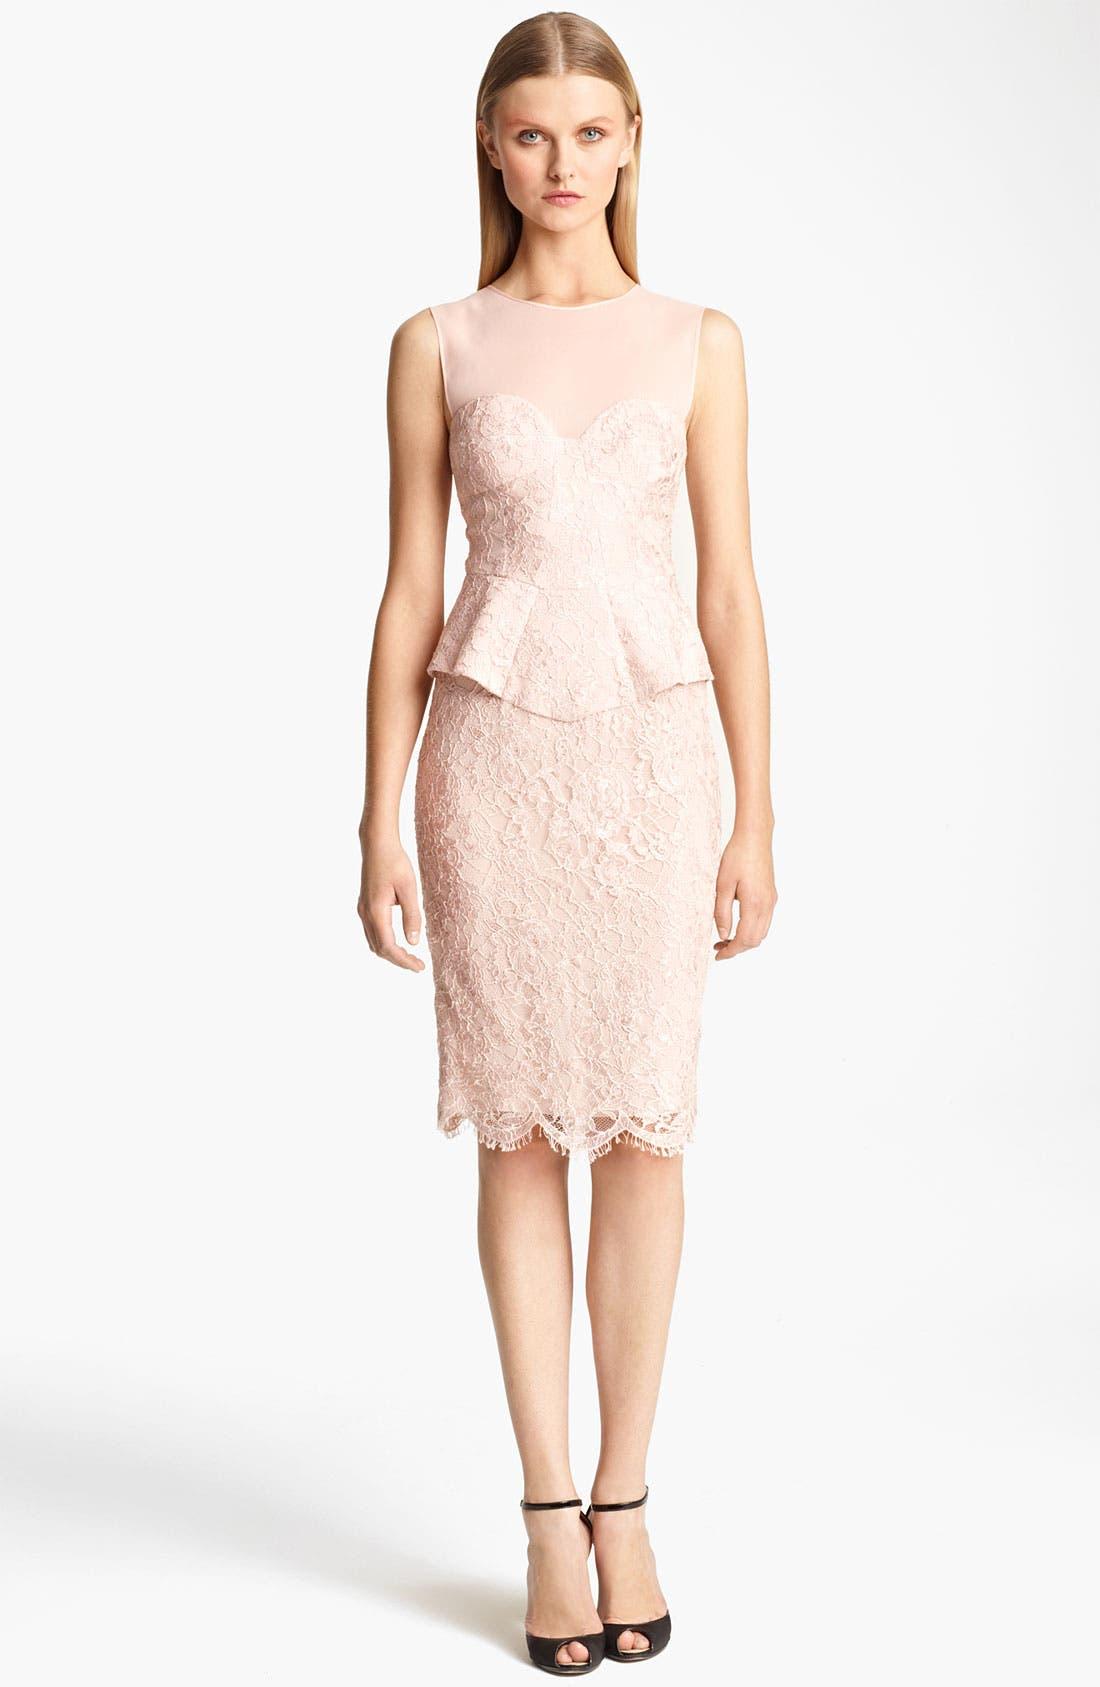 Alternate Image 1 Selected - Emilio Pucci Peplum Lace Dress